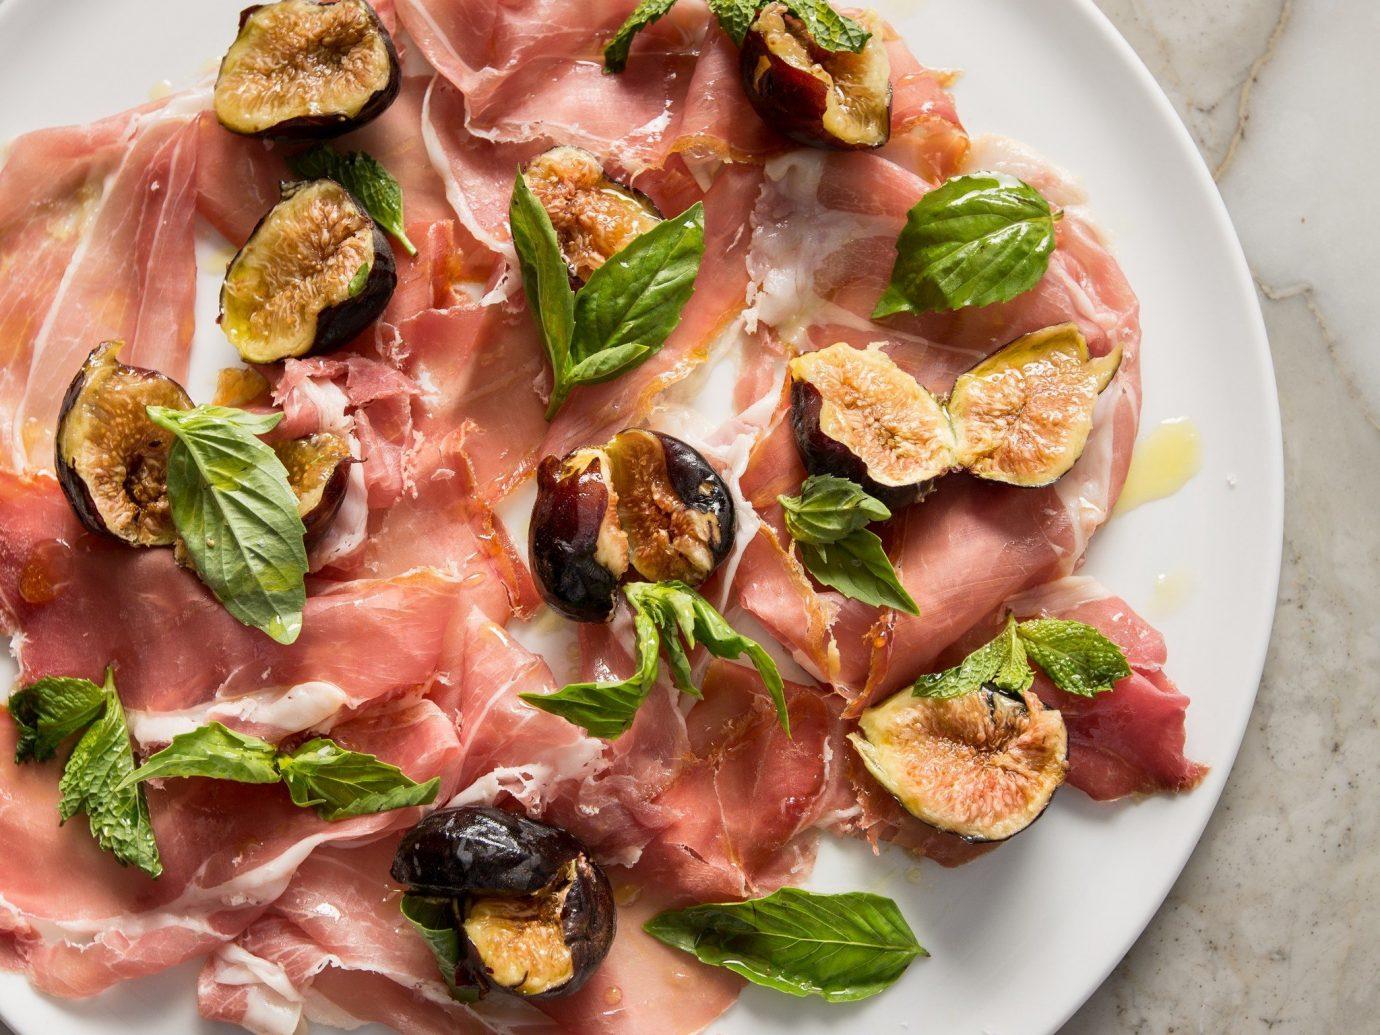 Food + Drink plate food dish meat prosciutto produce meal bruschetta cuisine vegetable salt cured meat breakfast pork piece de resistance